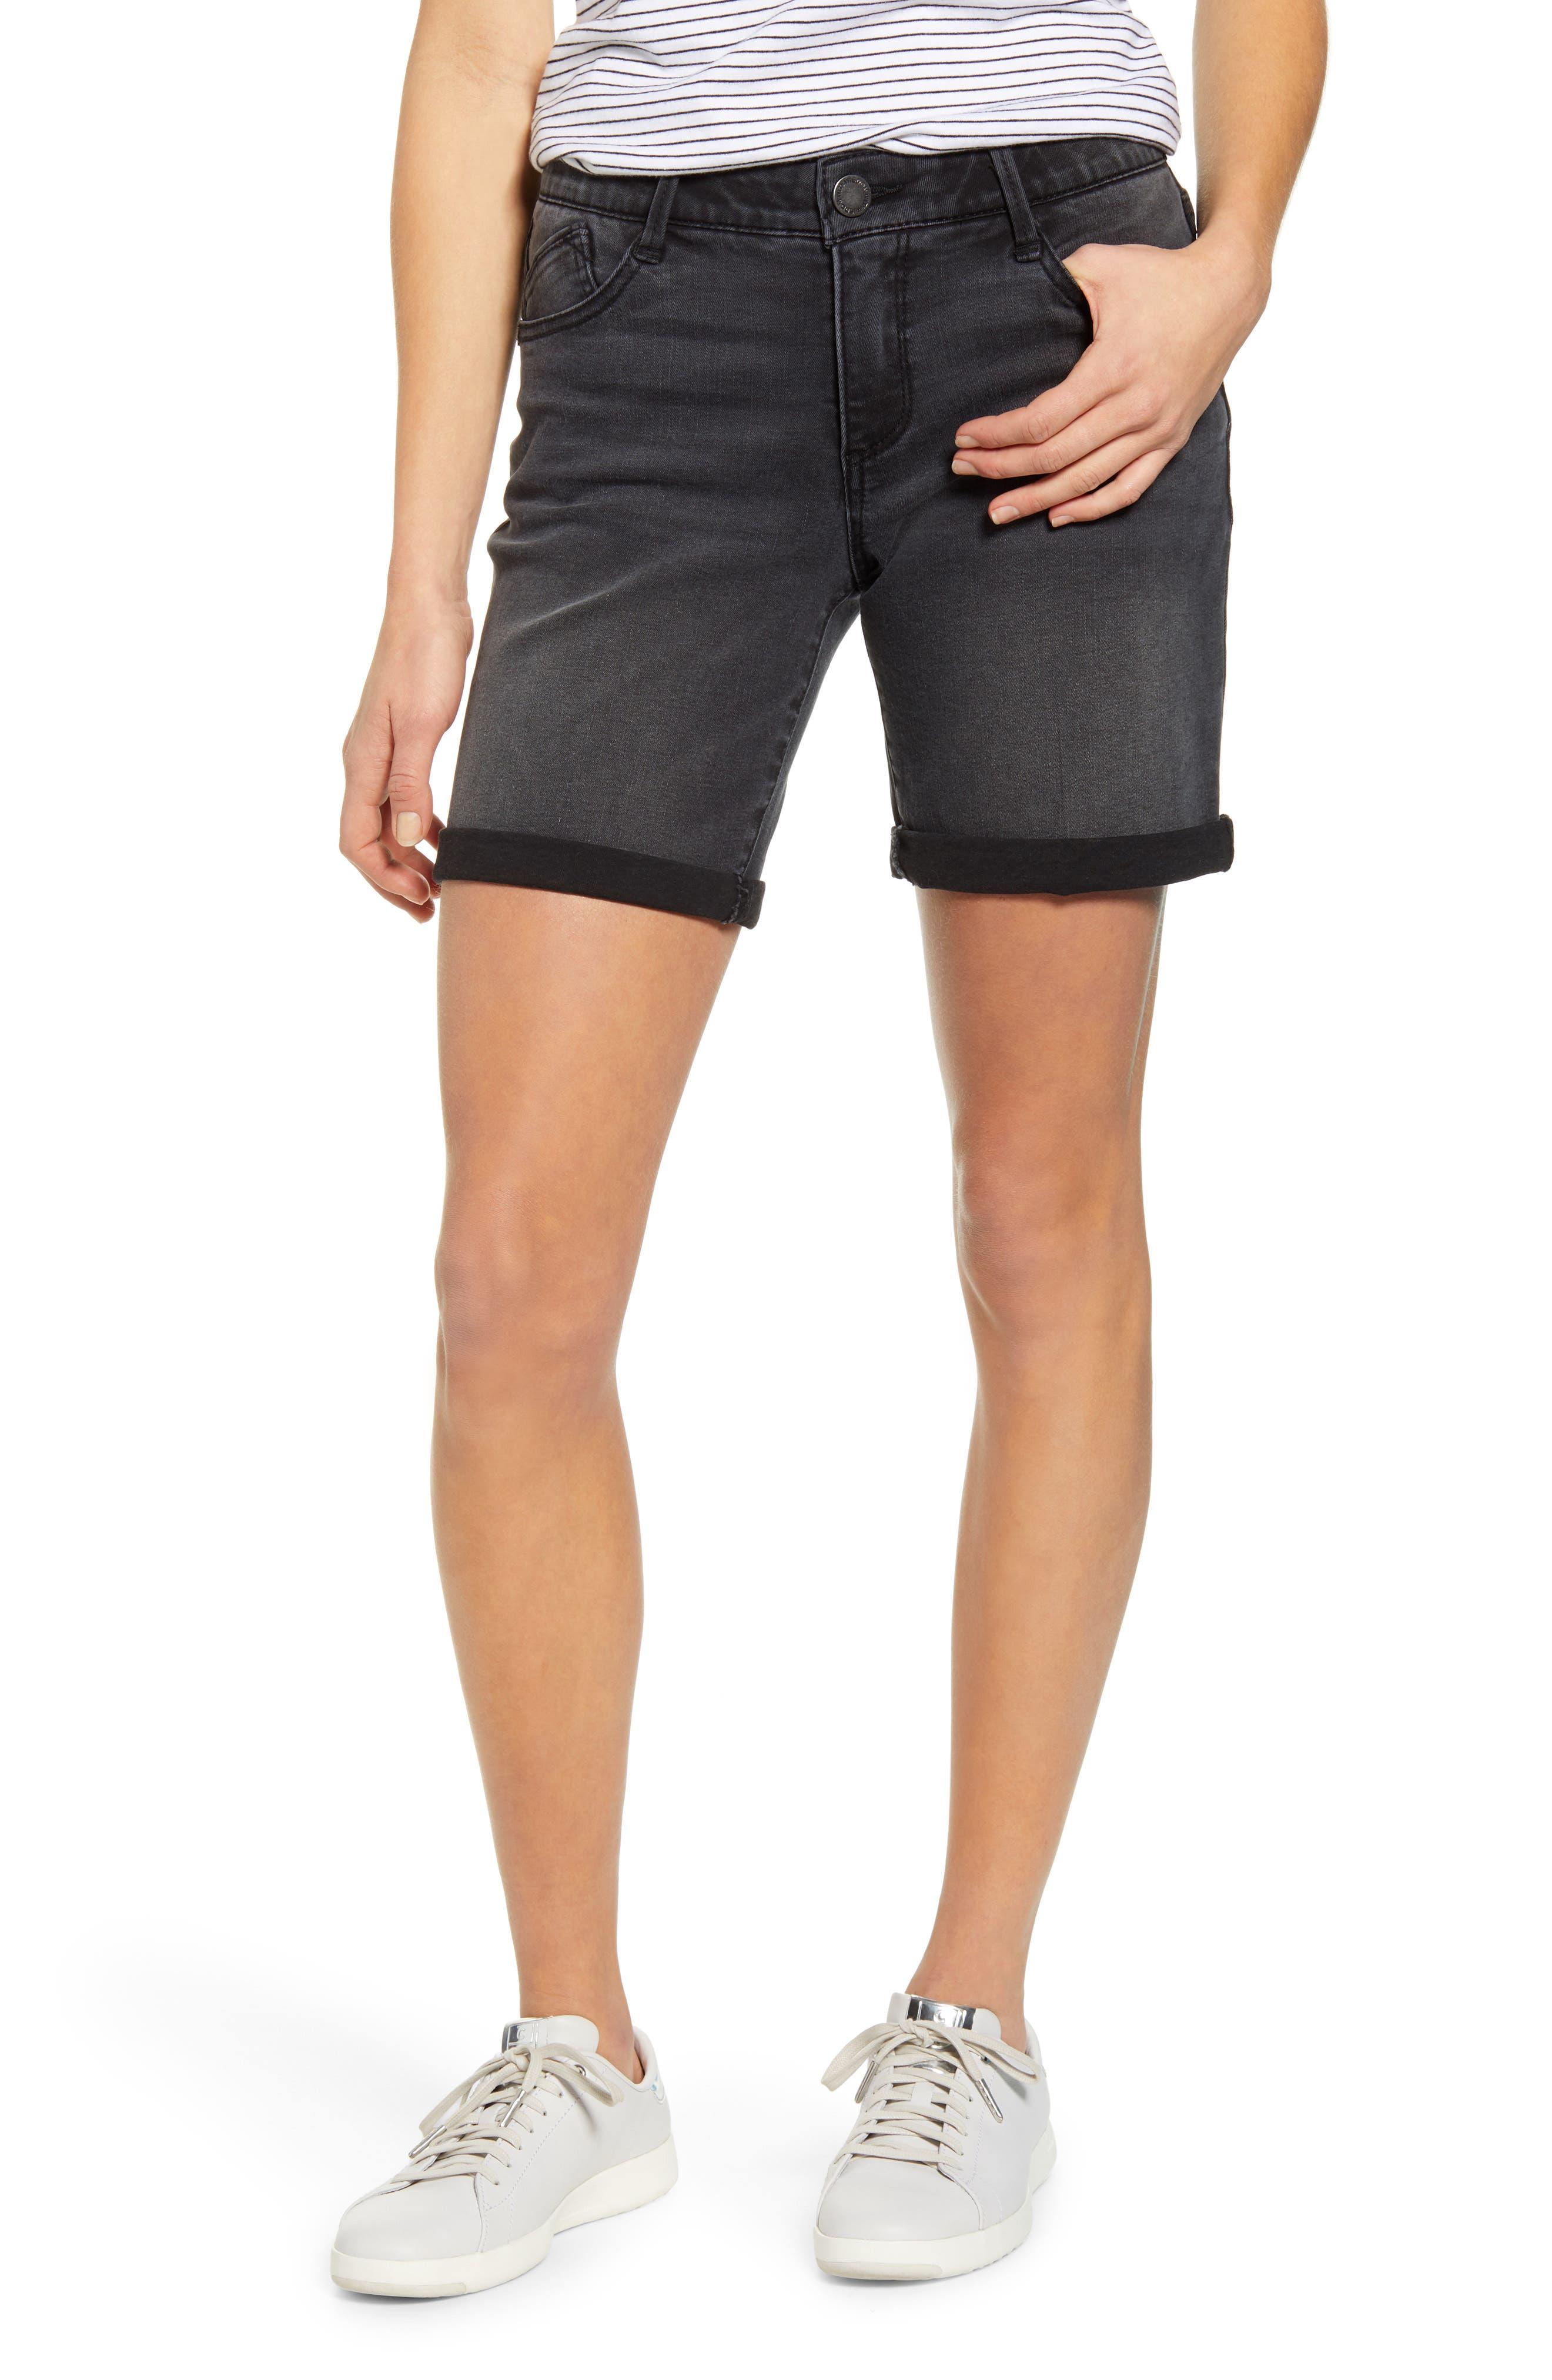 Women's Wit & Wisdom Ab-Solution White Denim Shorts,  12 - Black (Regular & Petite) (Nordstrom Exclusive)